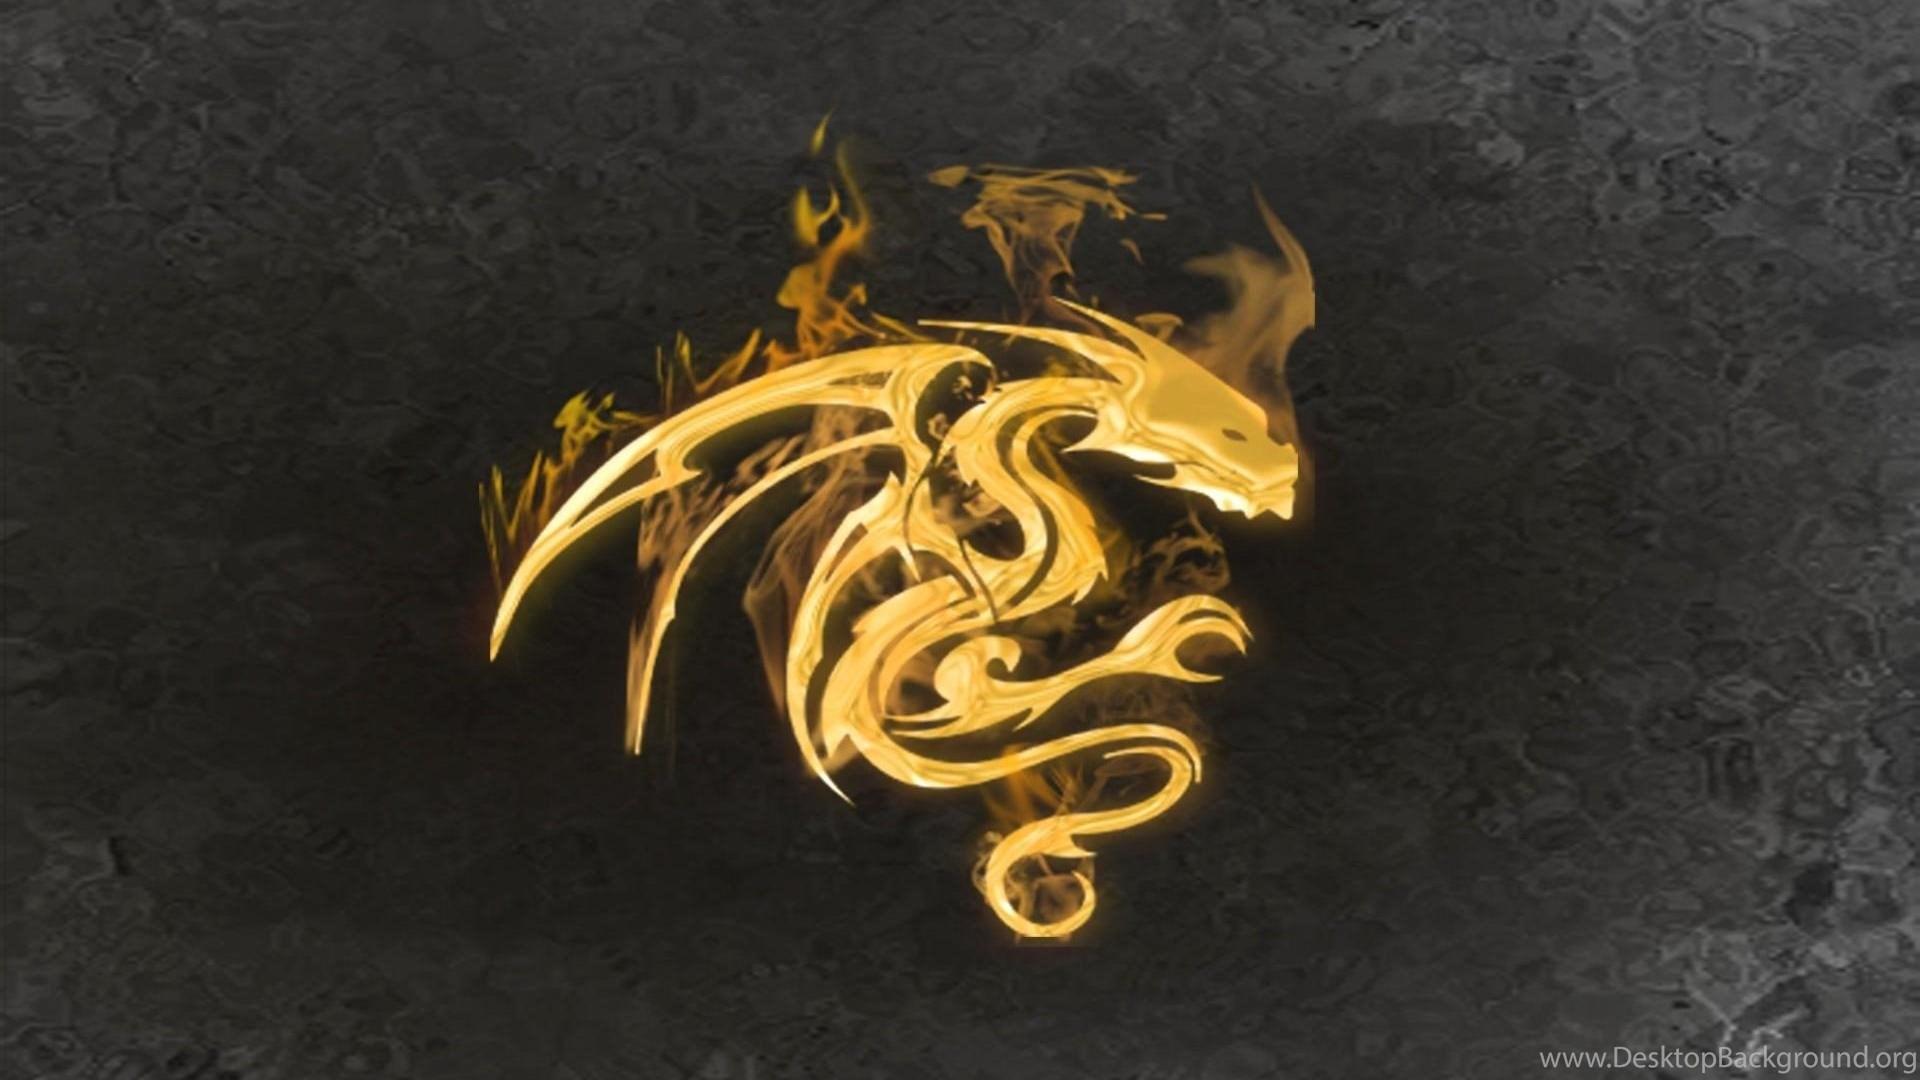 FIRE DRAGON WALLPAPER Desktop Background